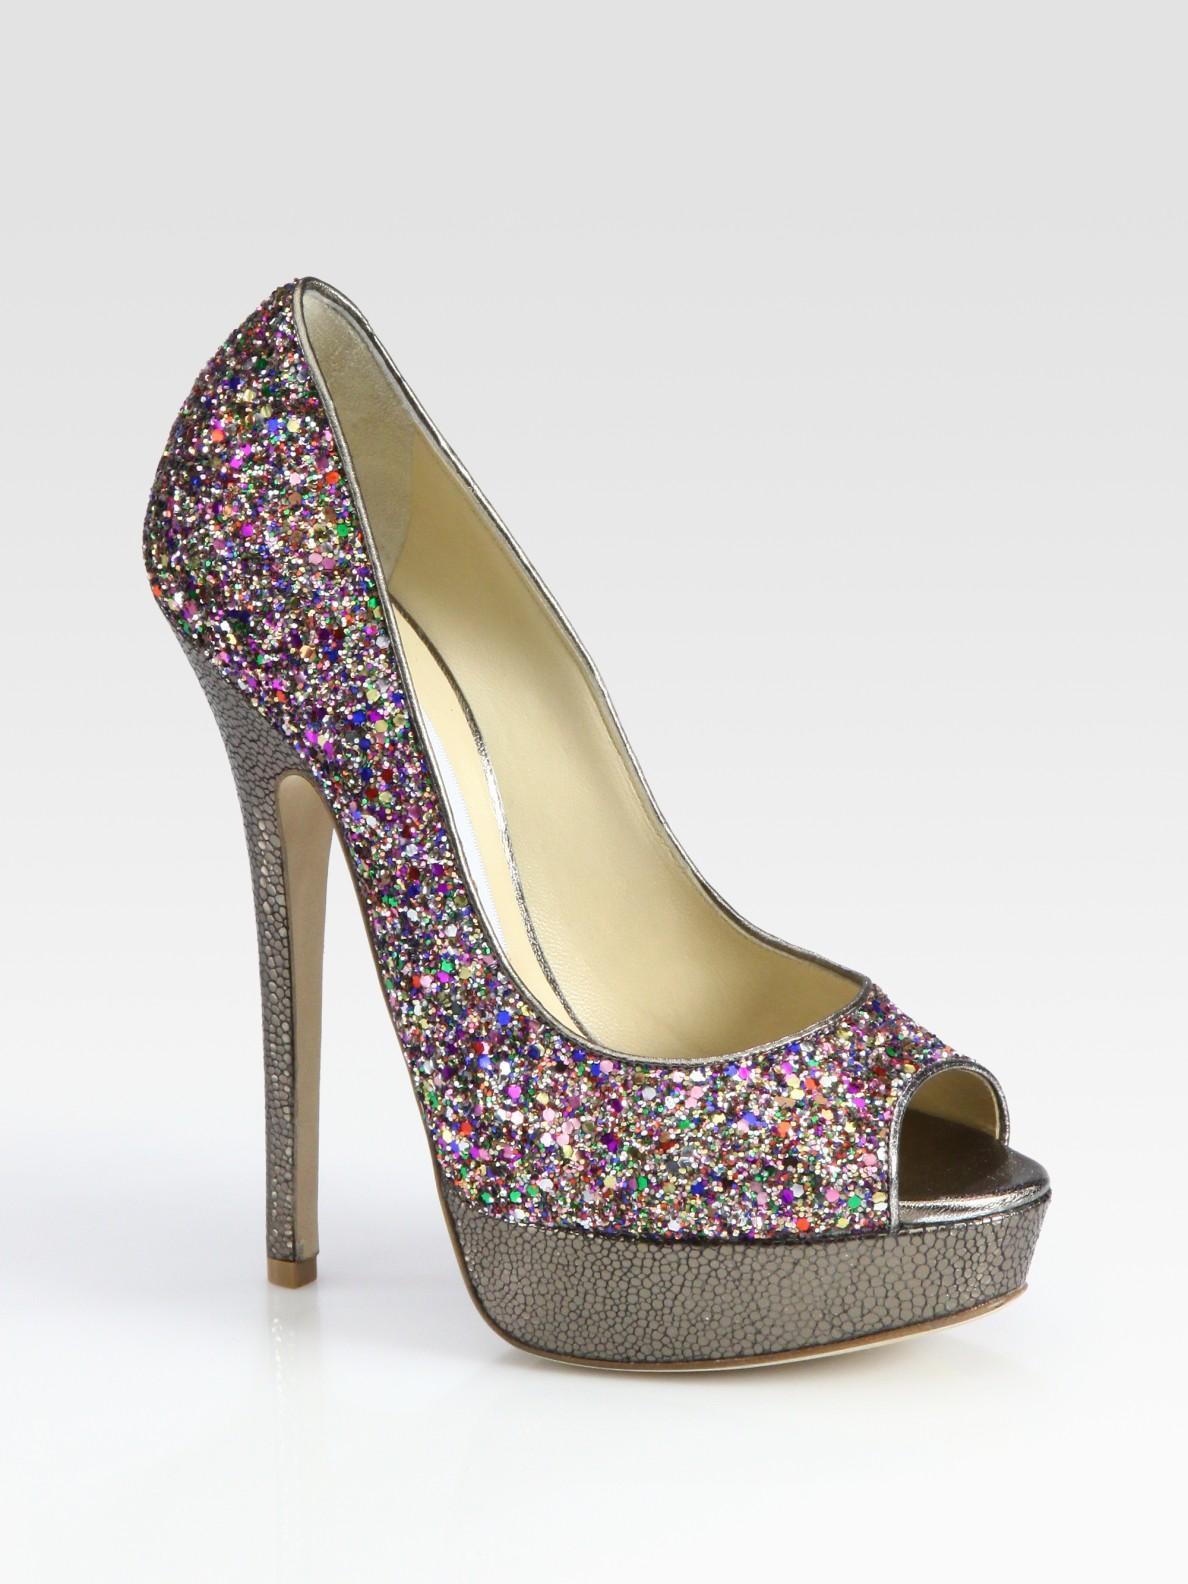 c8c6a7cd477 Lyst - Jimmy Choo Vibe Glitter-coated Leather Peep Toe Pumps in Purple